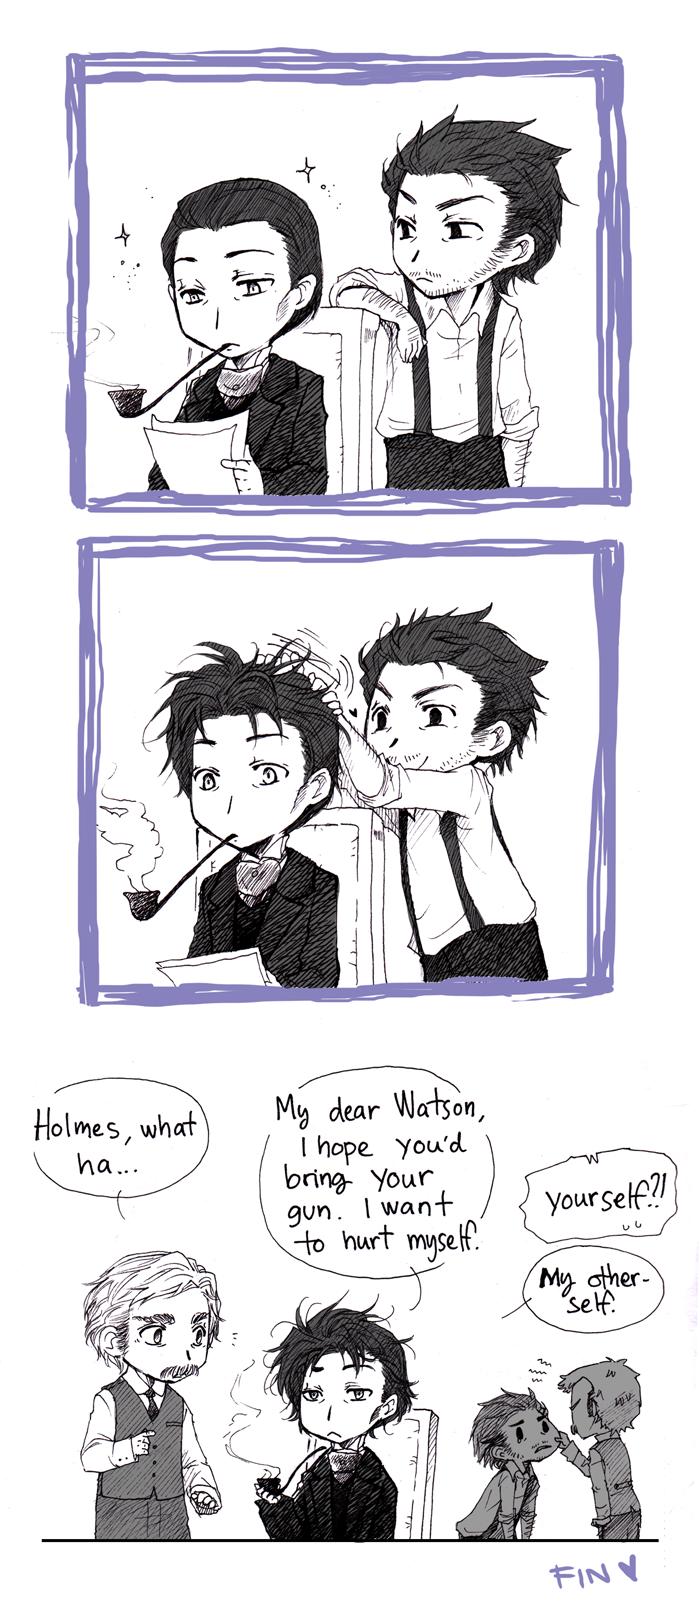 Holmes' bad hair day